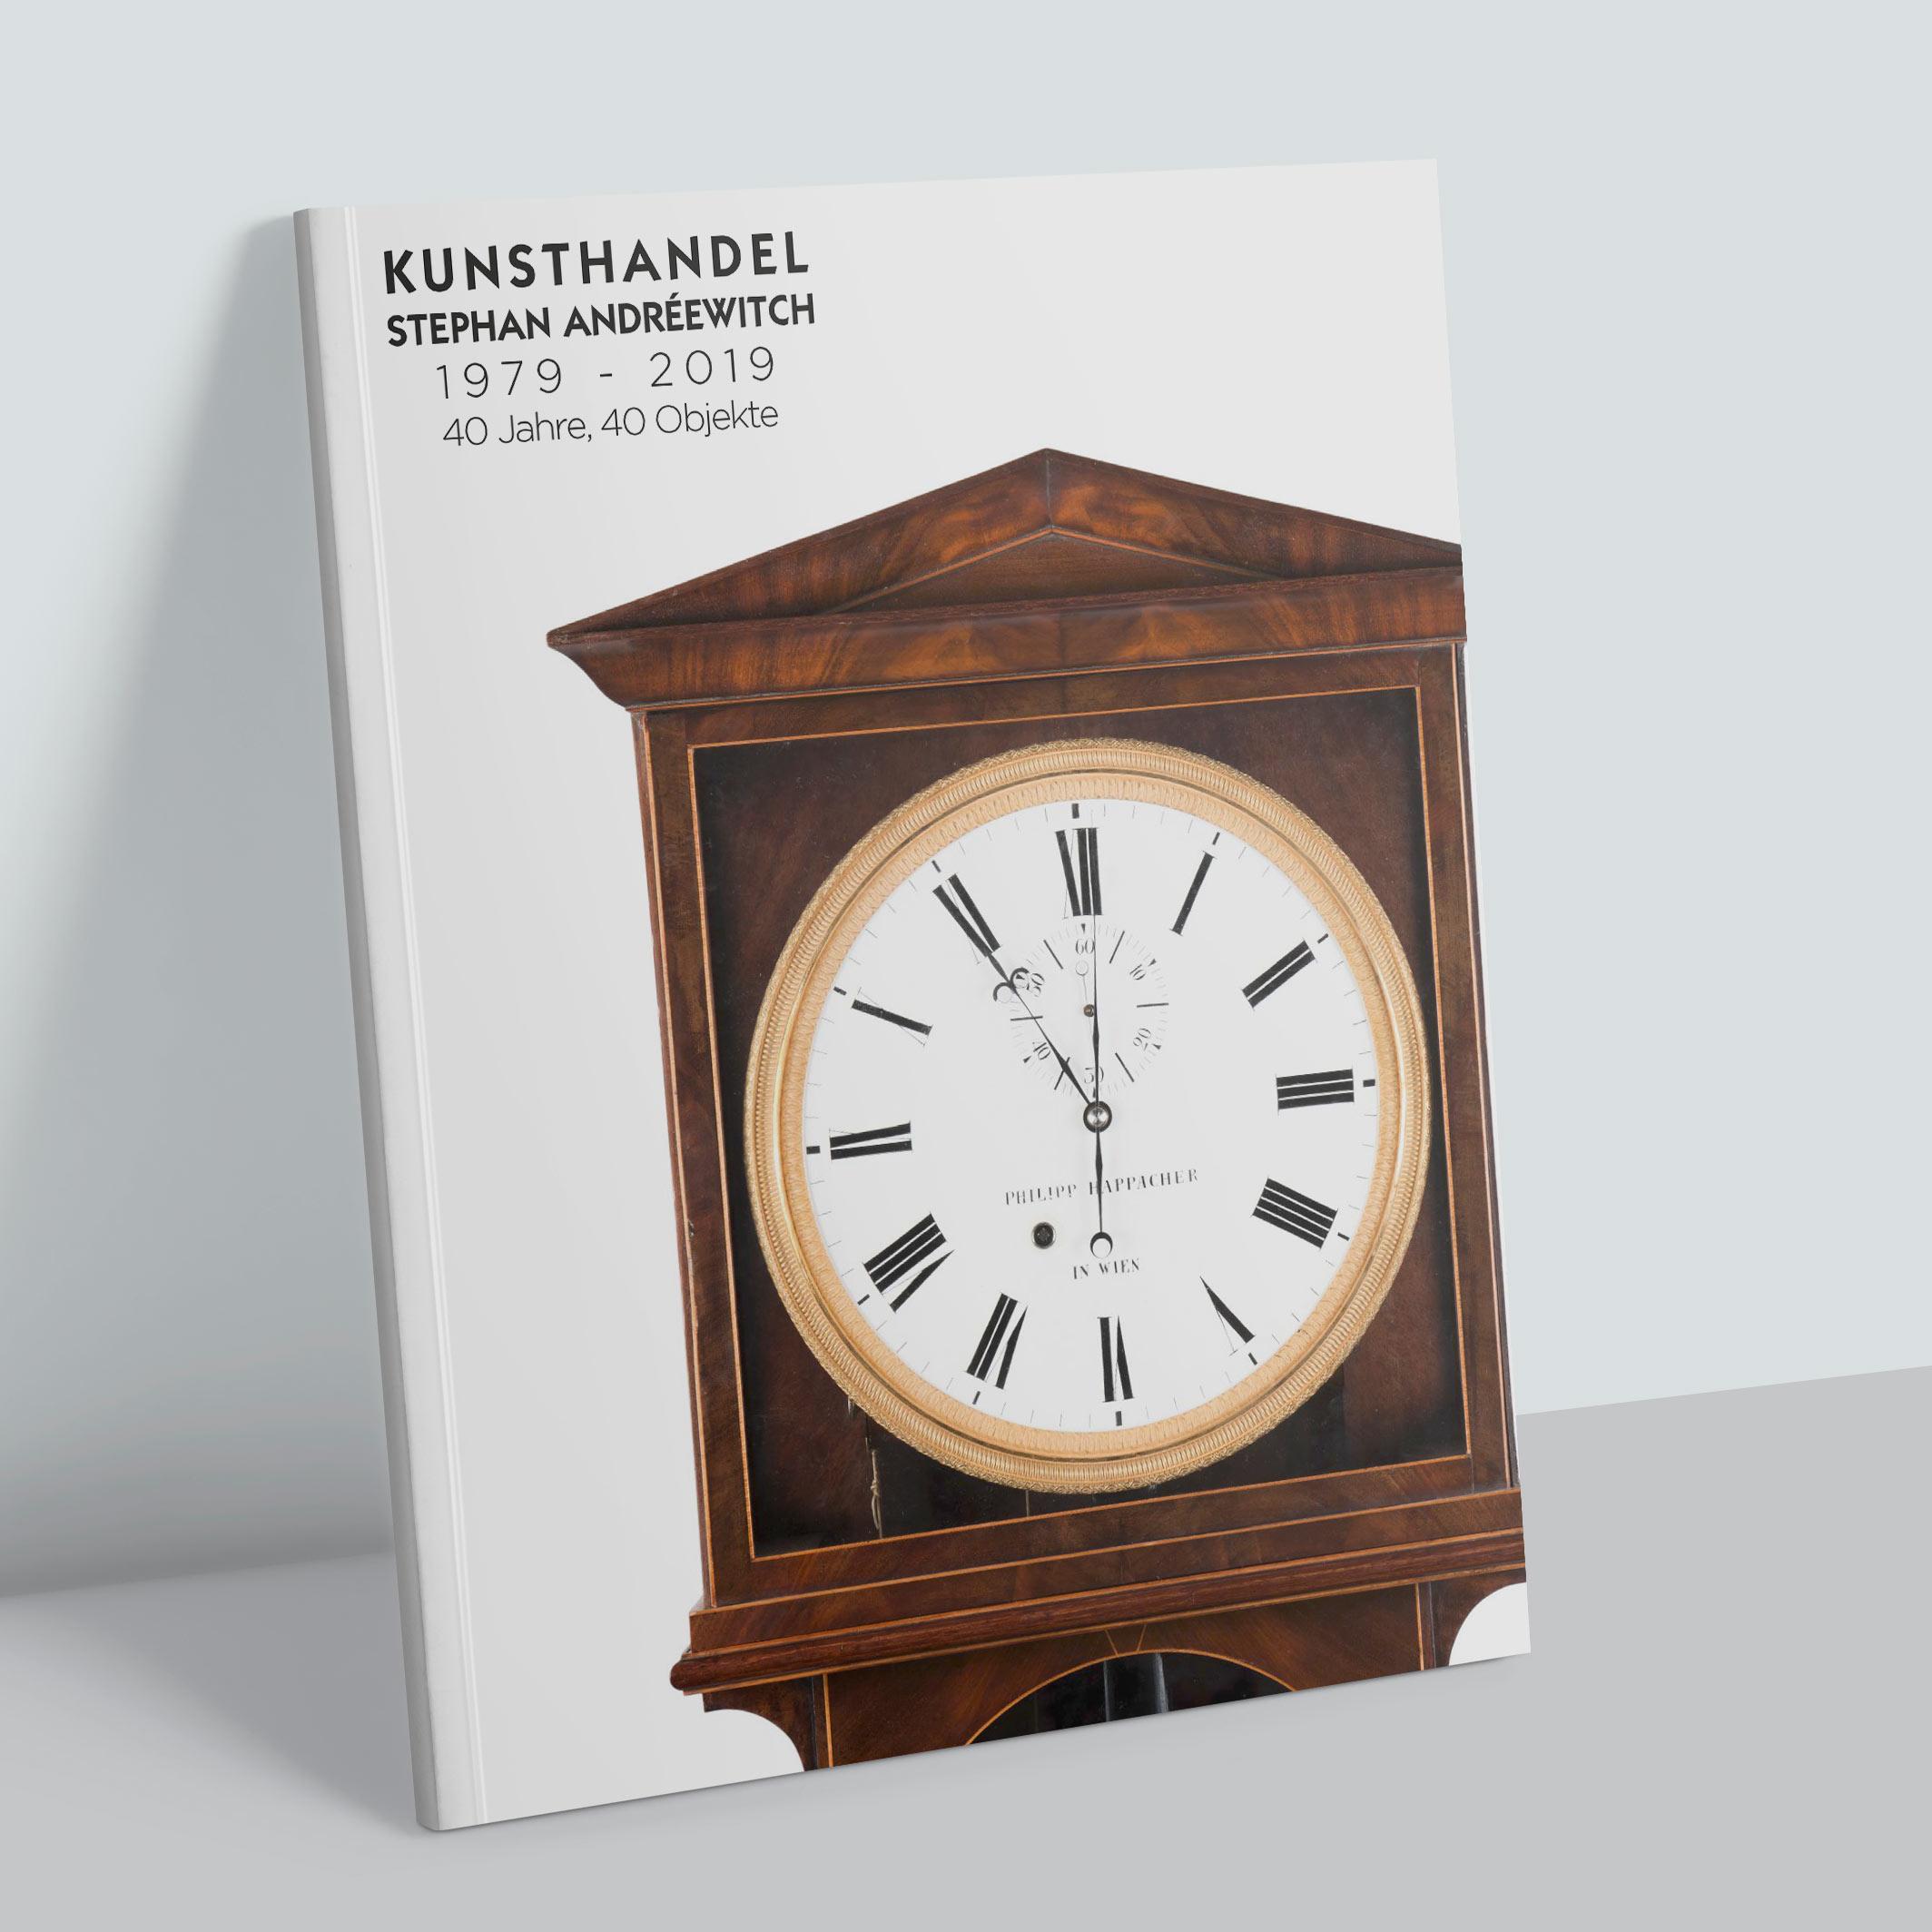 Antiquitaeten-Katalog-Wien